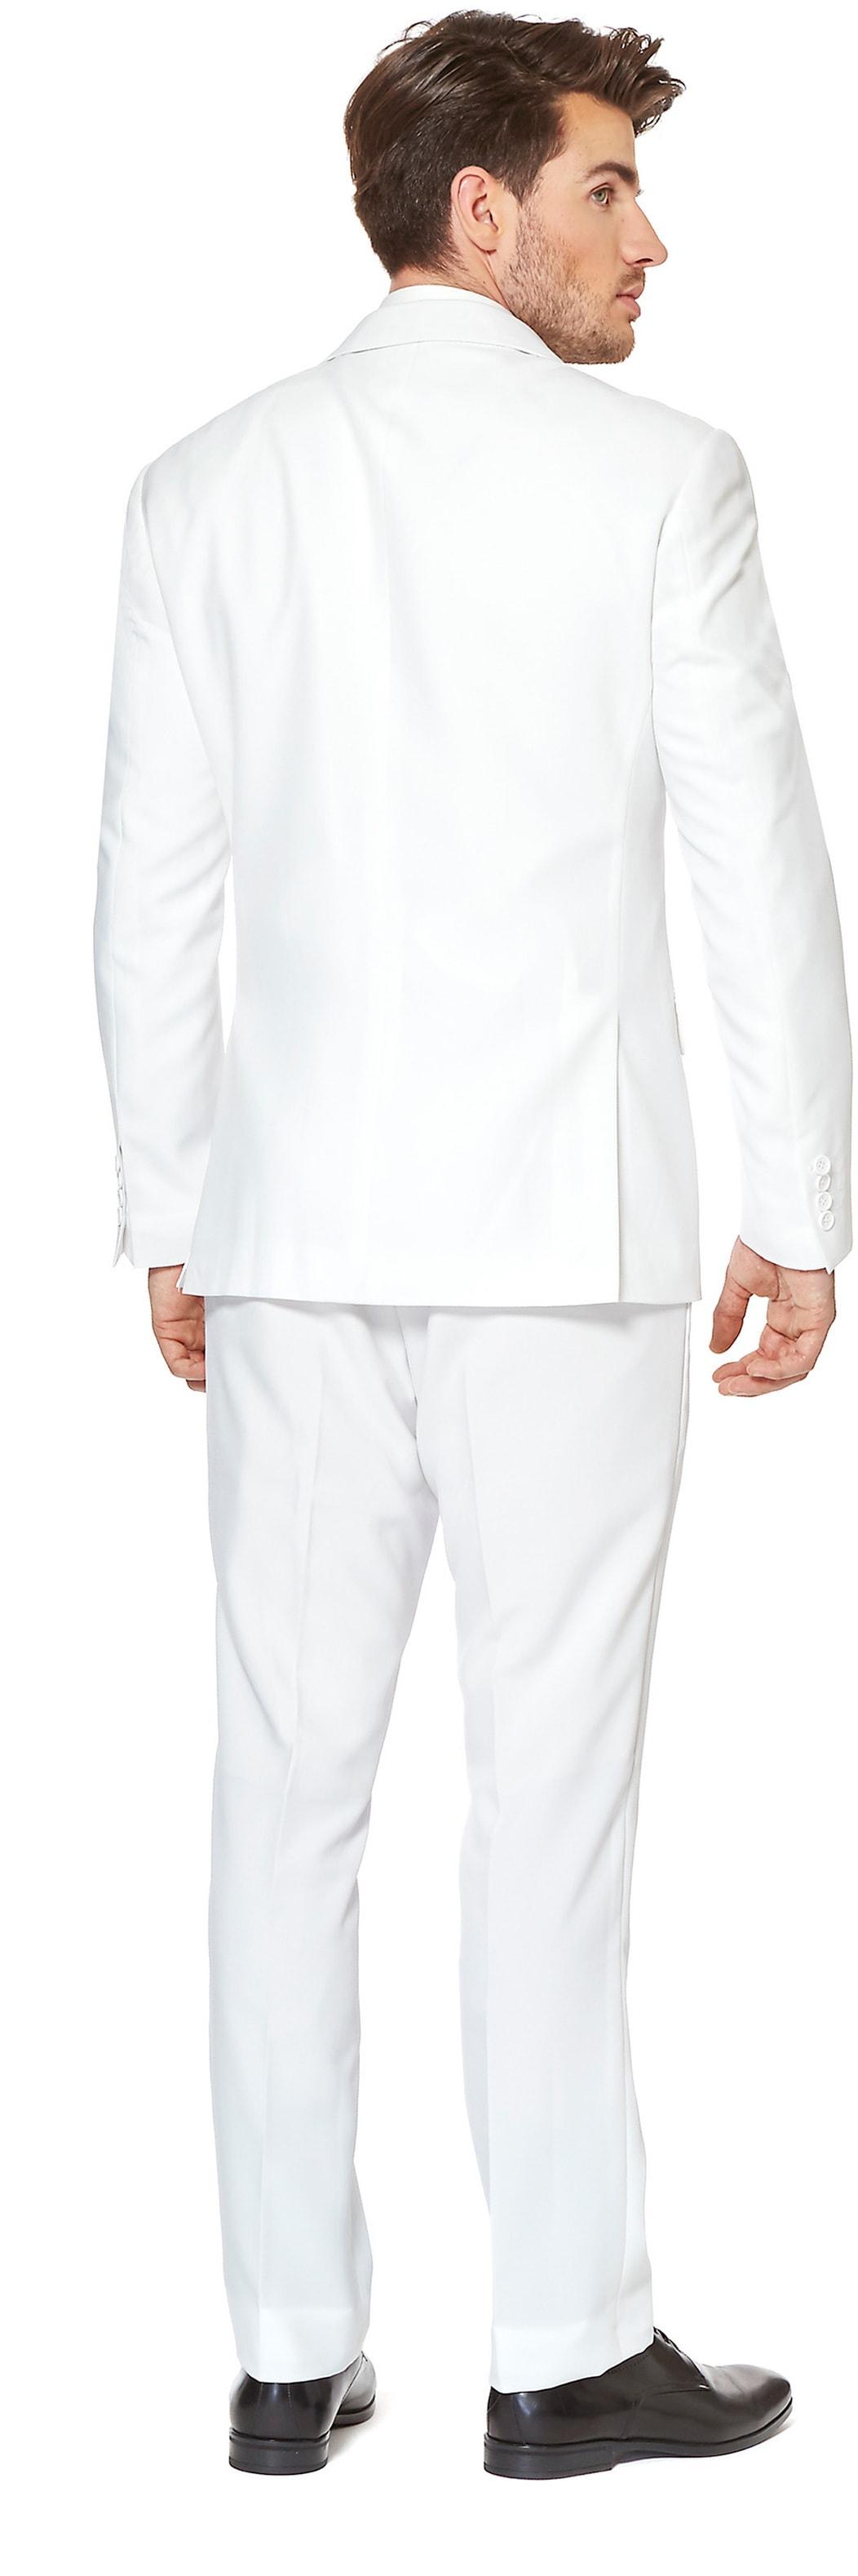 OppoSuits White Knight Anzug foto 1